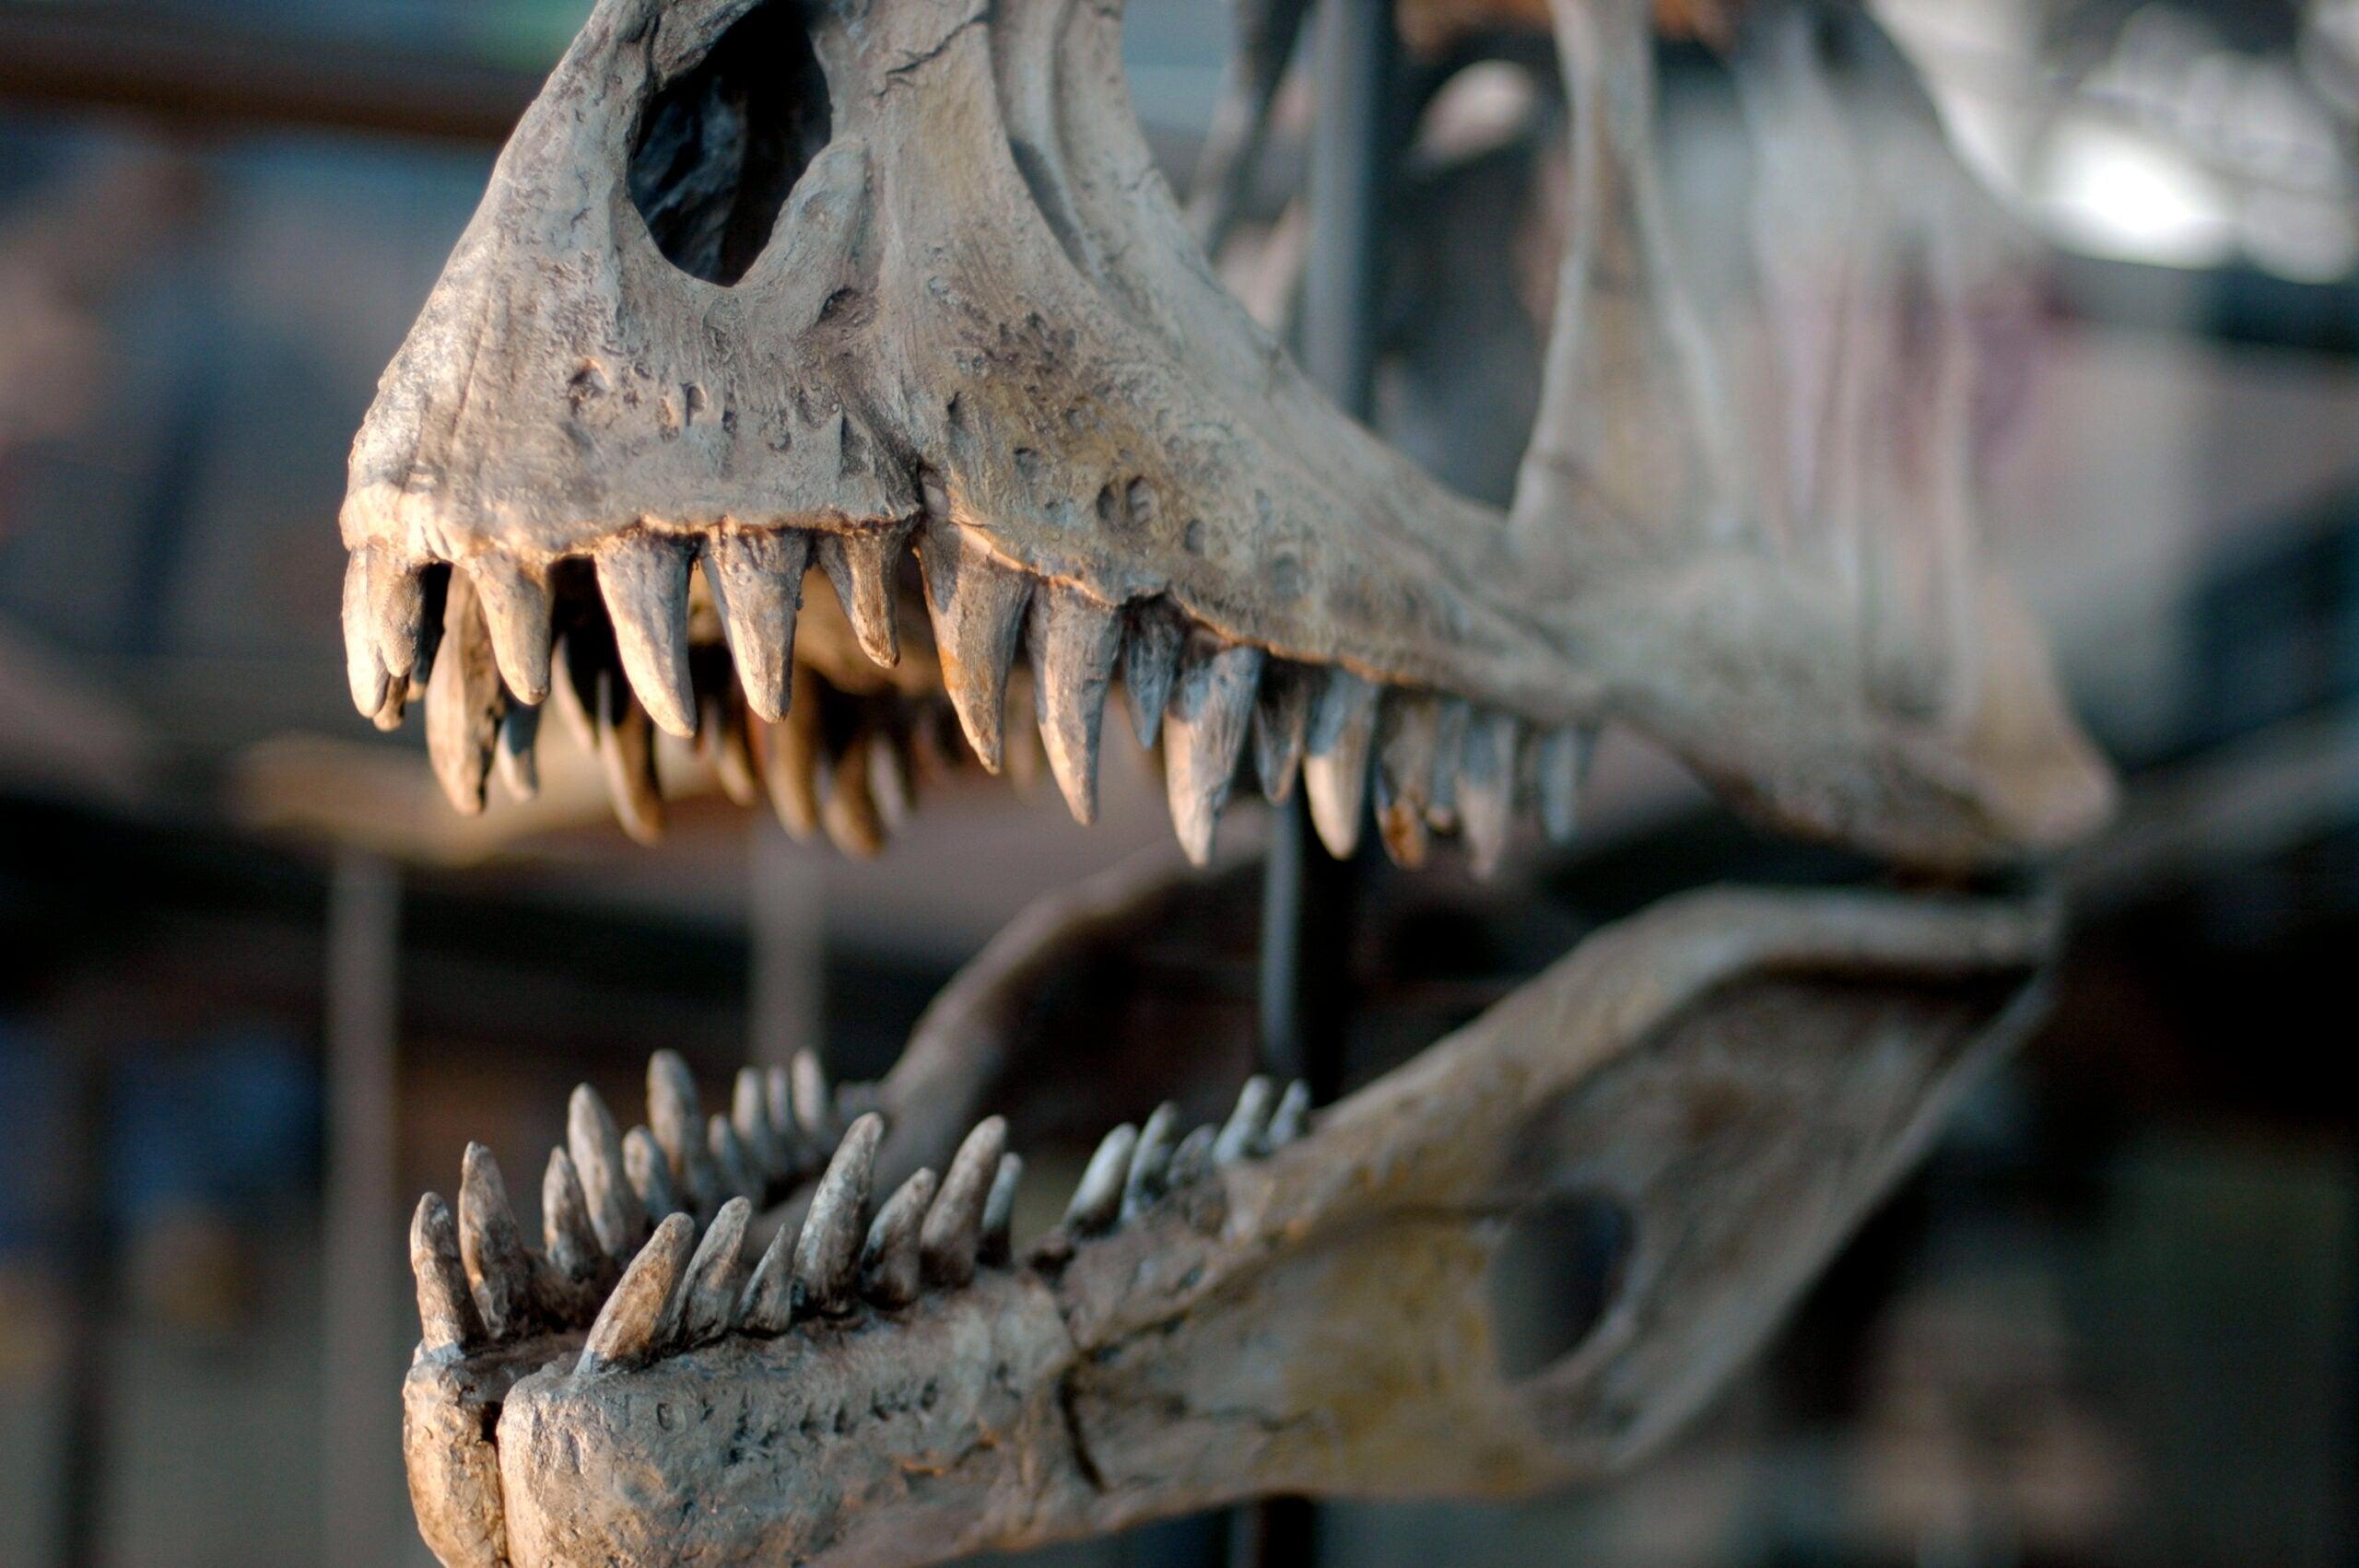 Nicolas Cage Is Returning A Stolen Dinosaur Skull To Mongolia